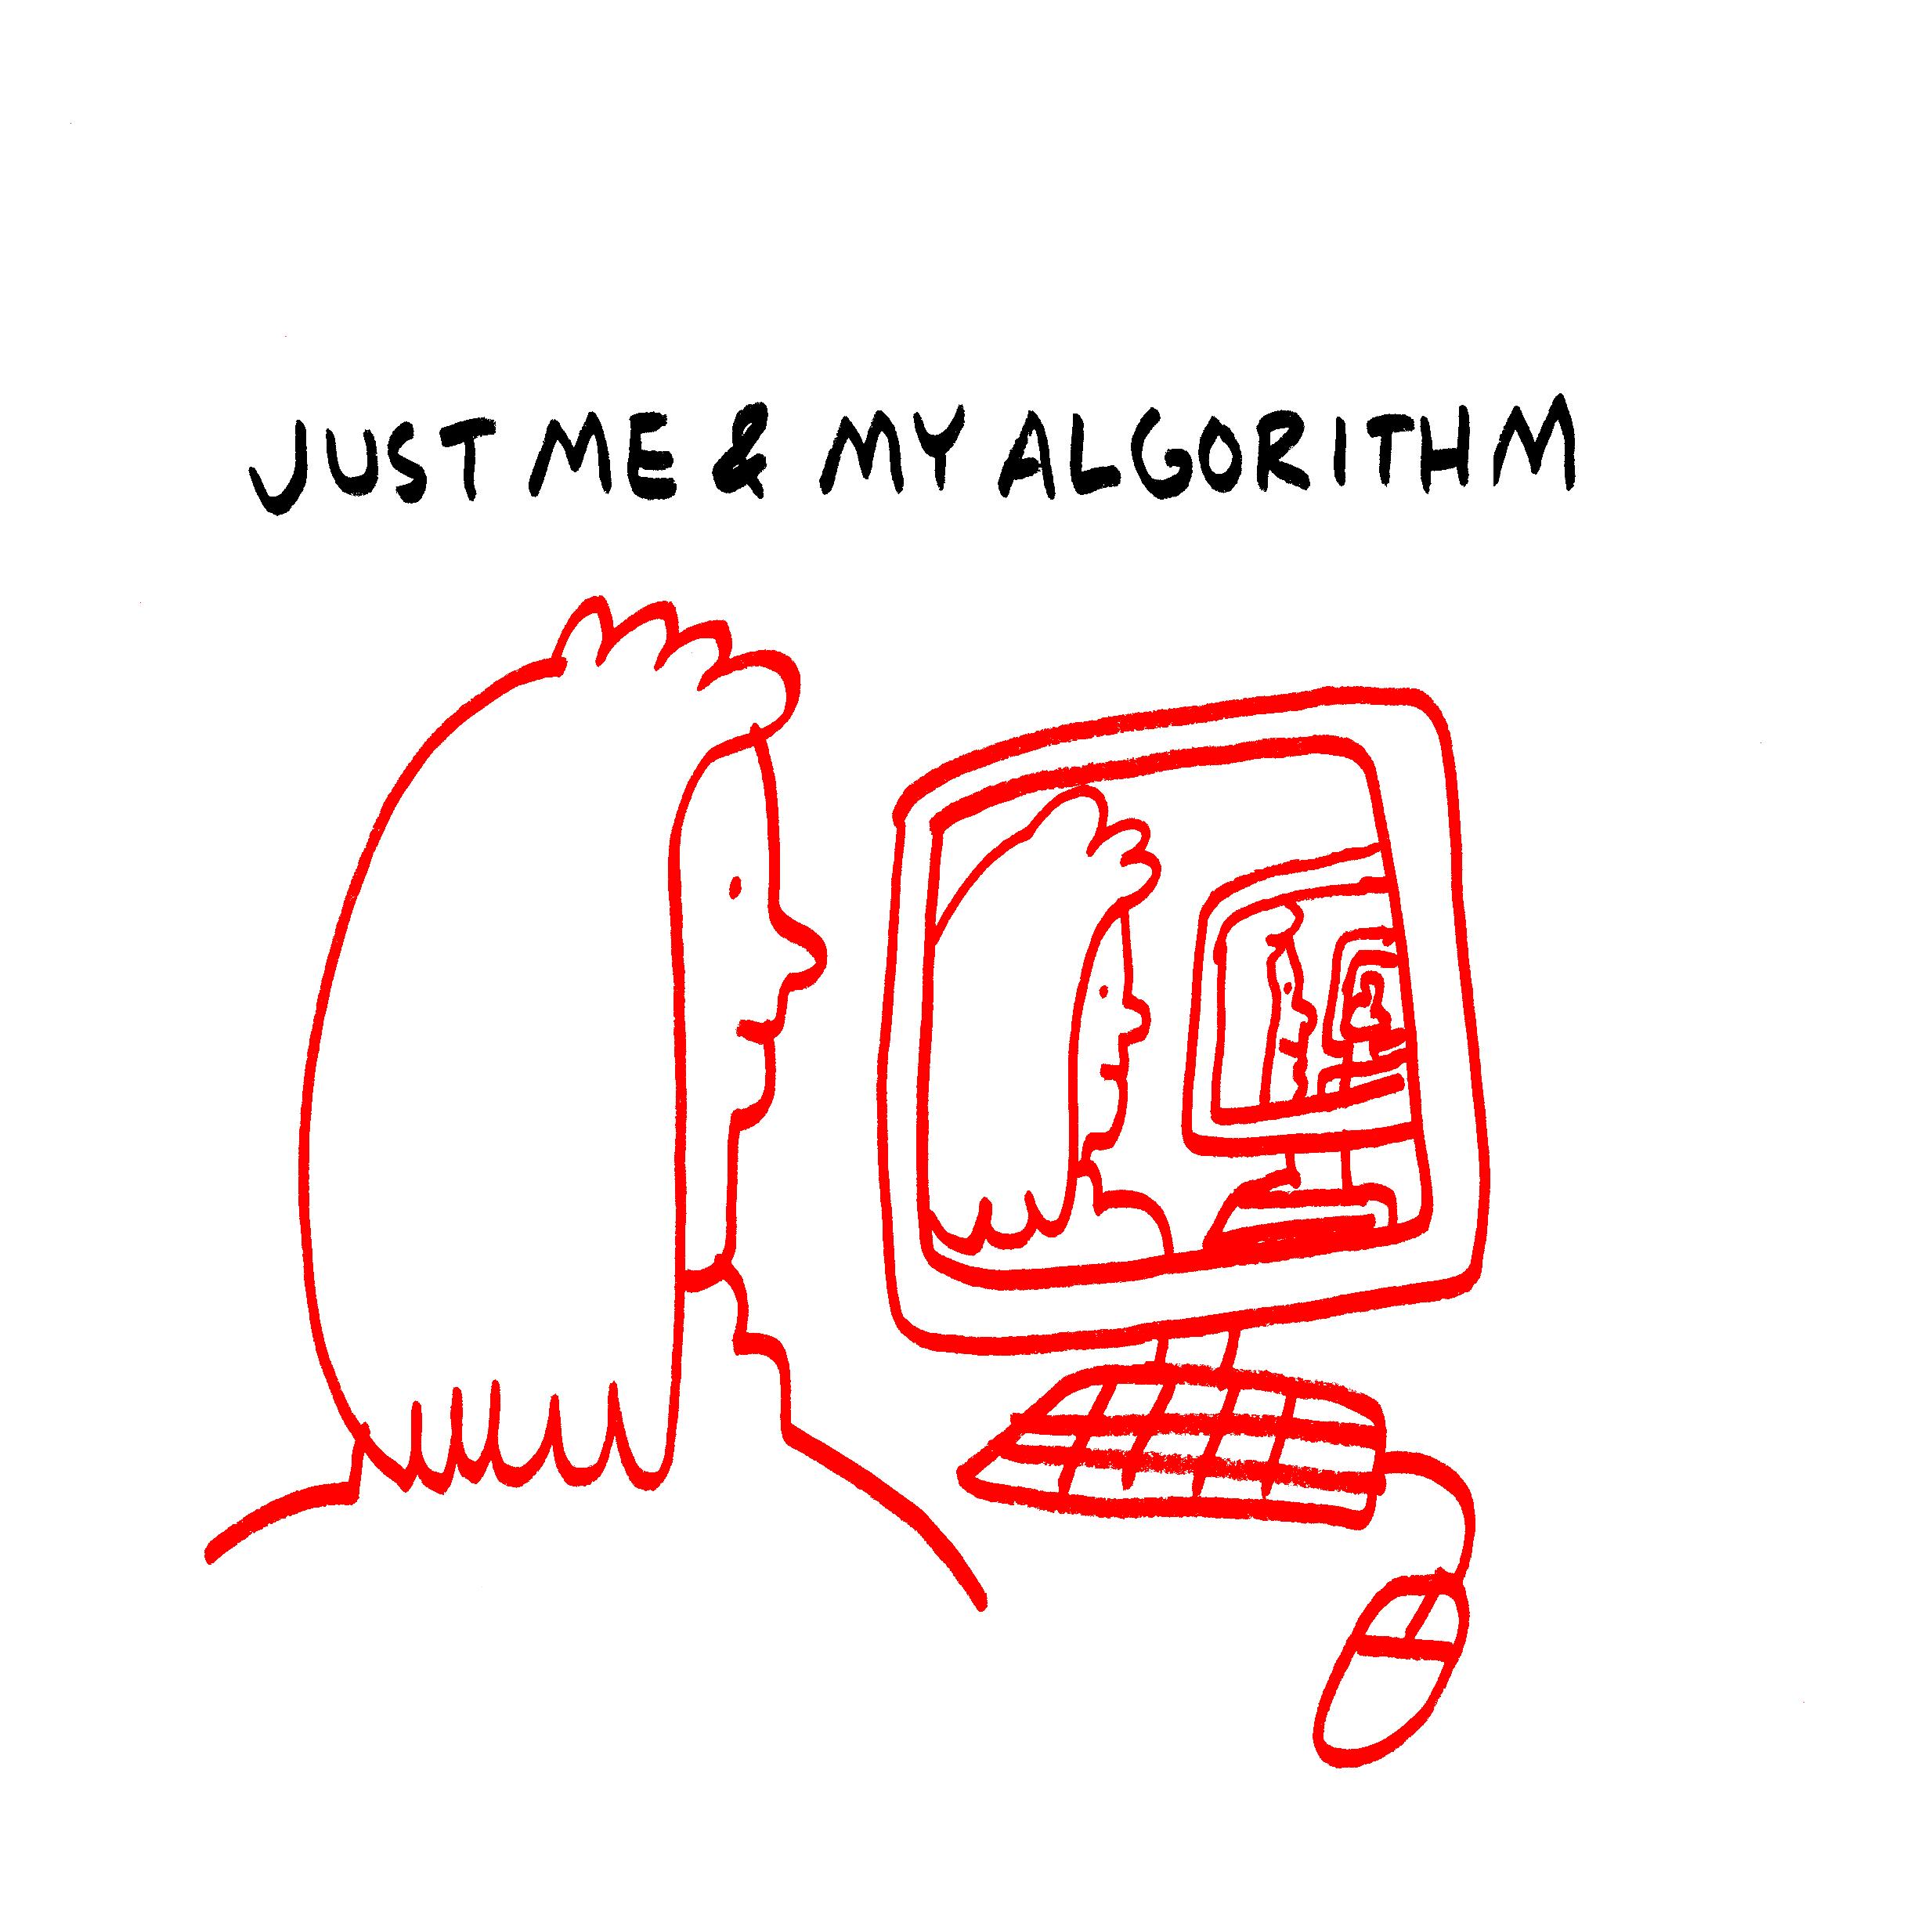 Just me & my algorithm